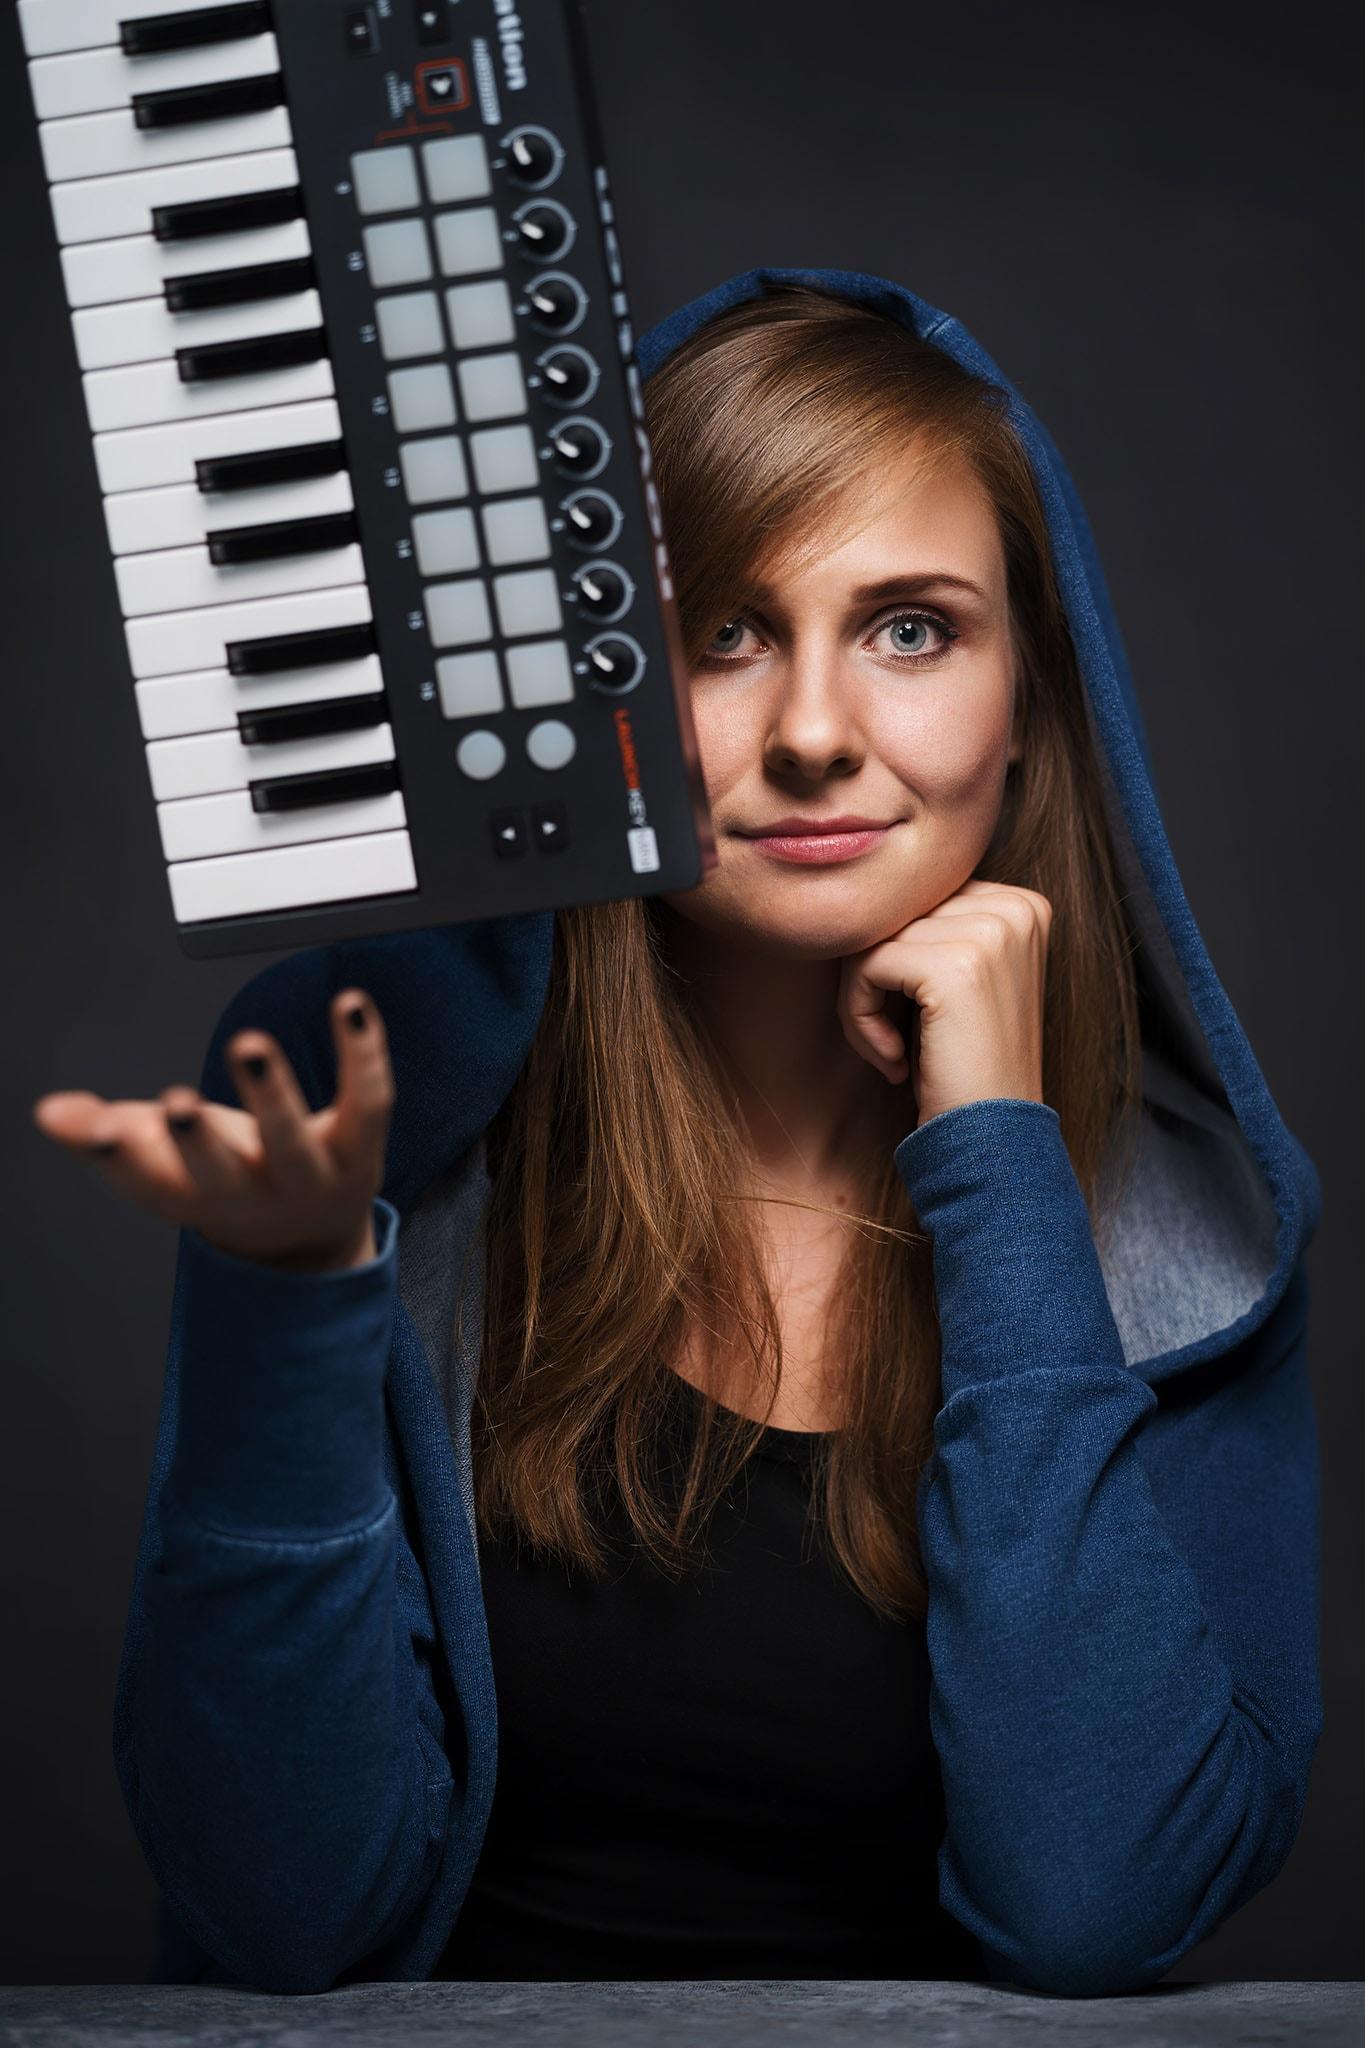 Portrety młodej kompozytorki